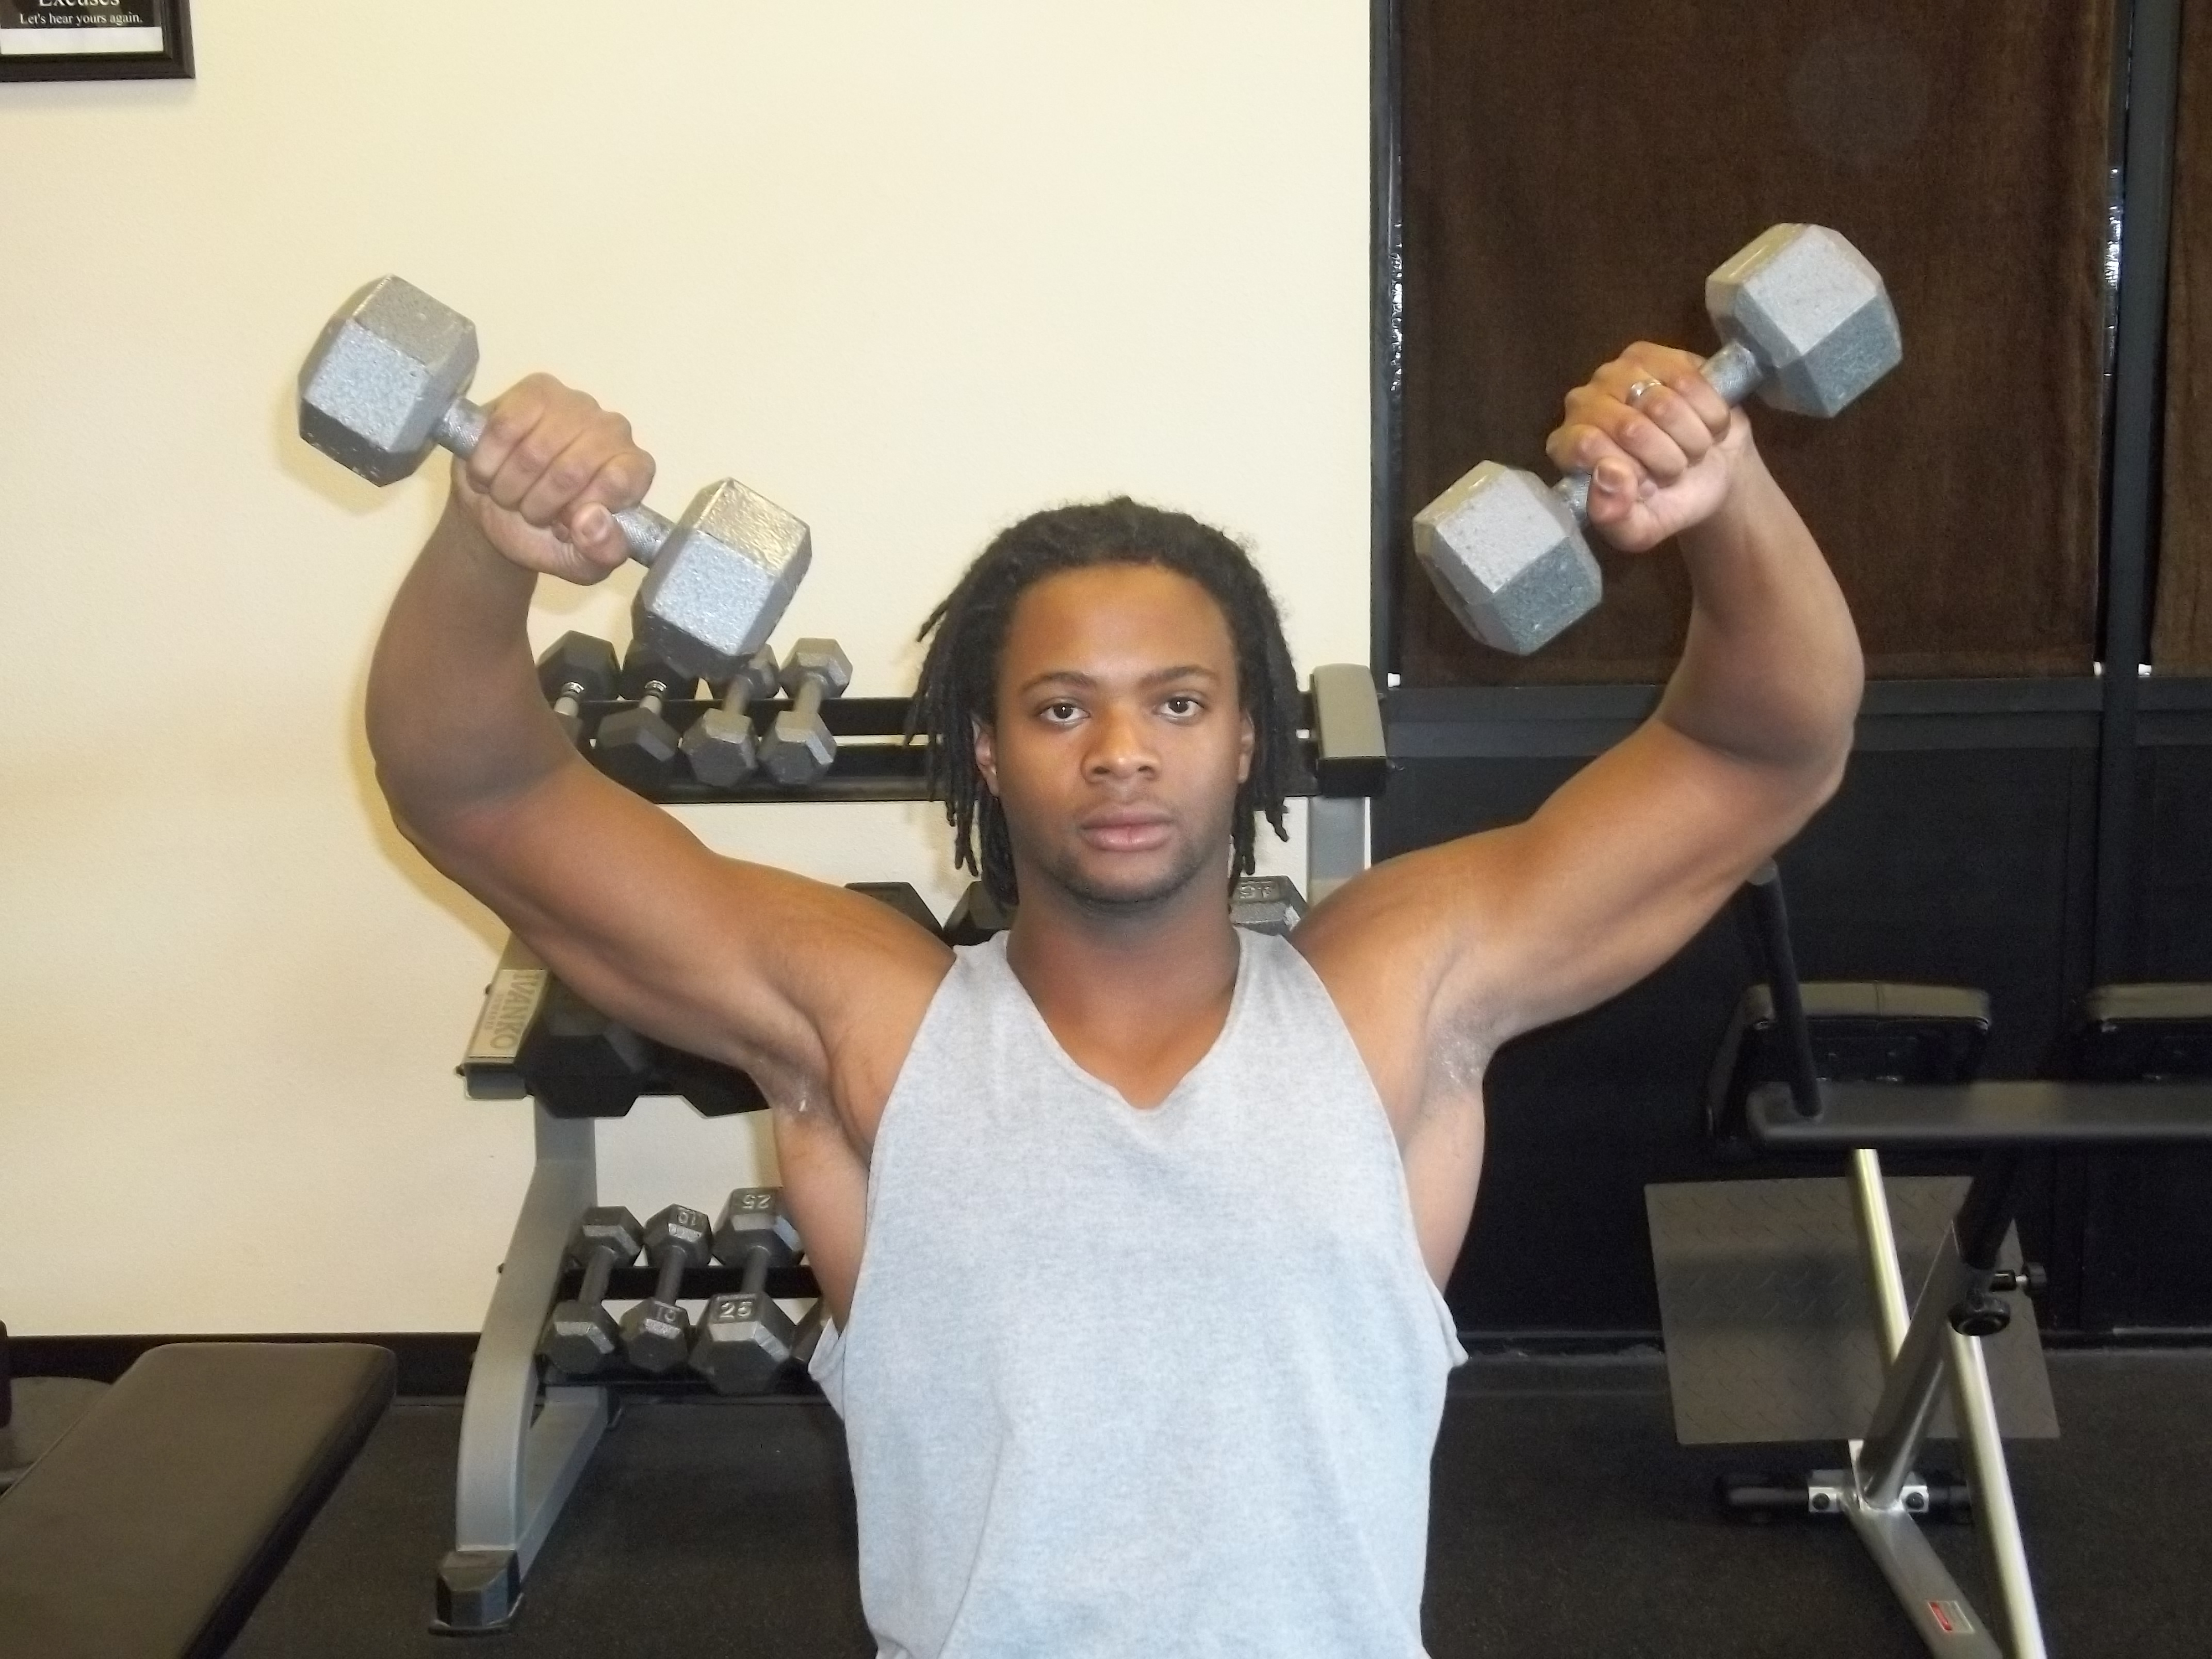 What Is Better Barbell Or Dumbbell Shoulder Press